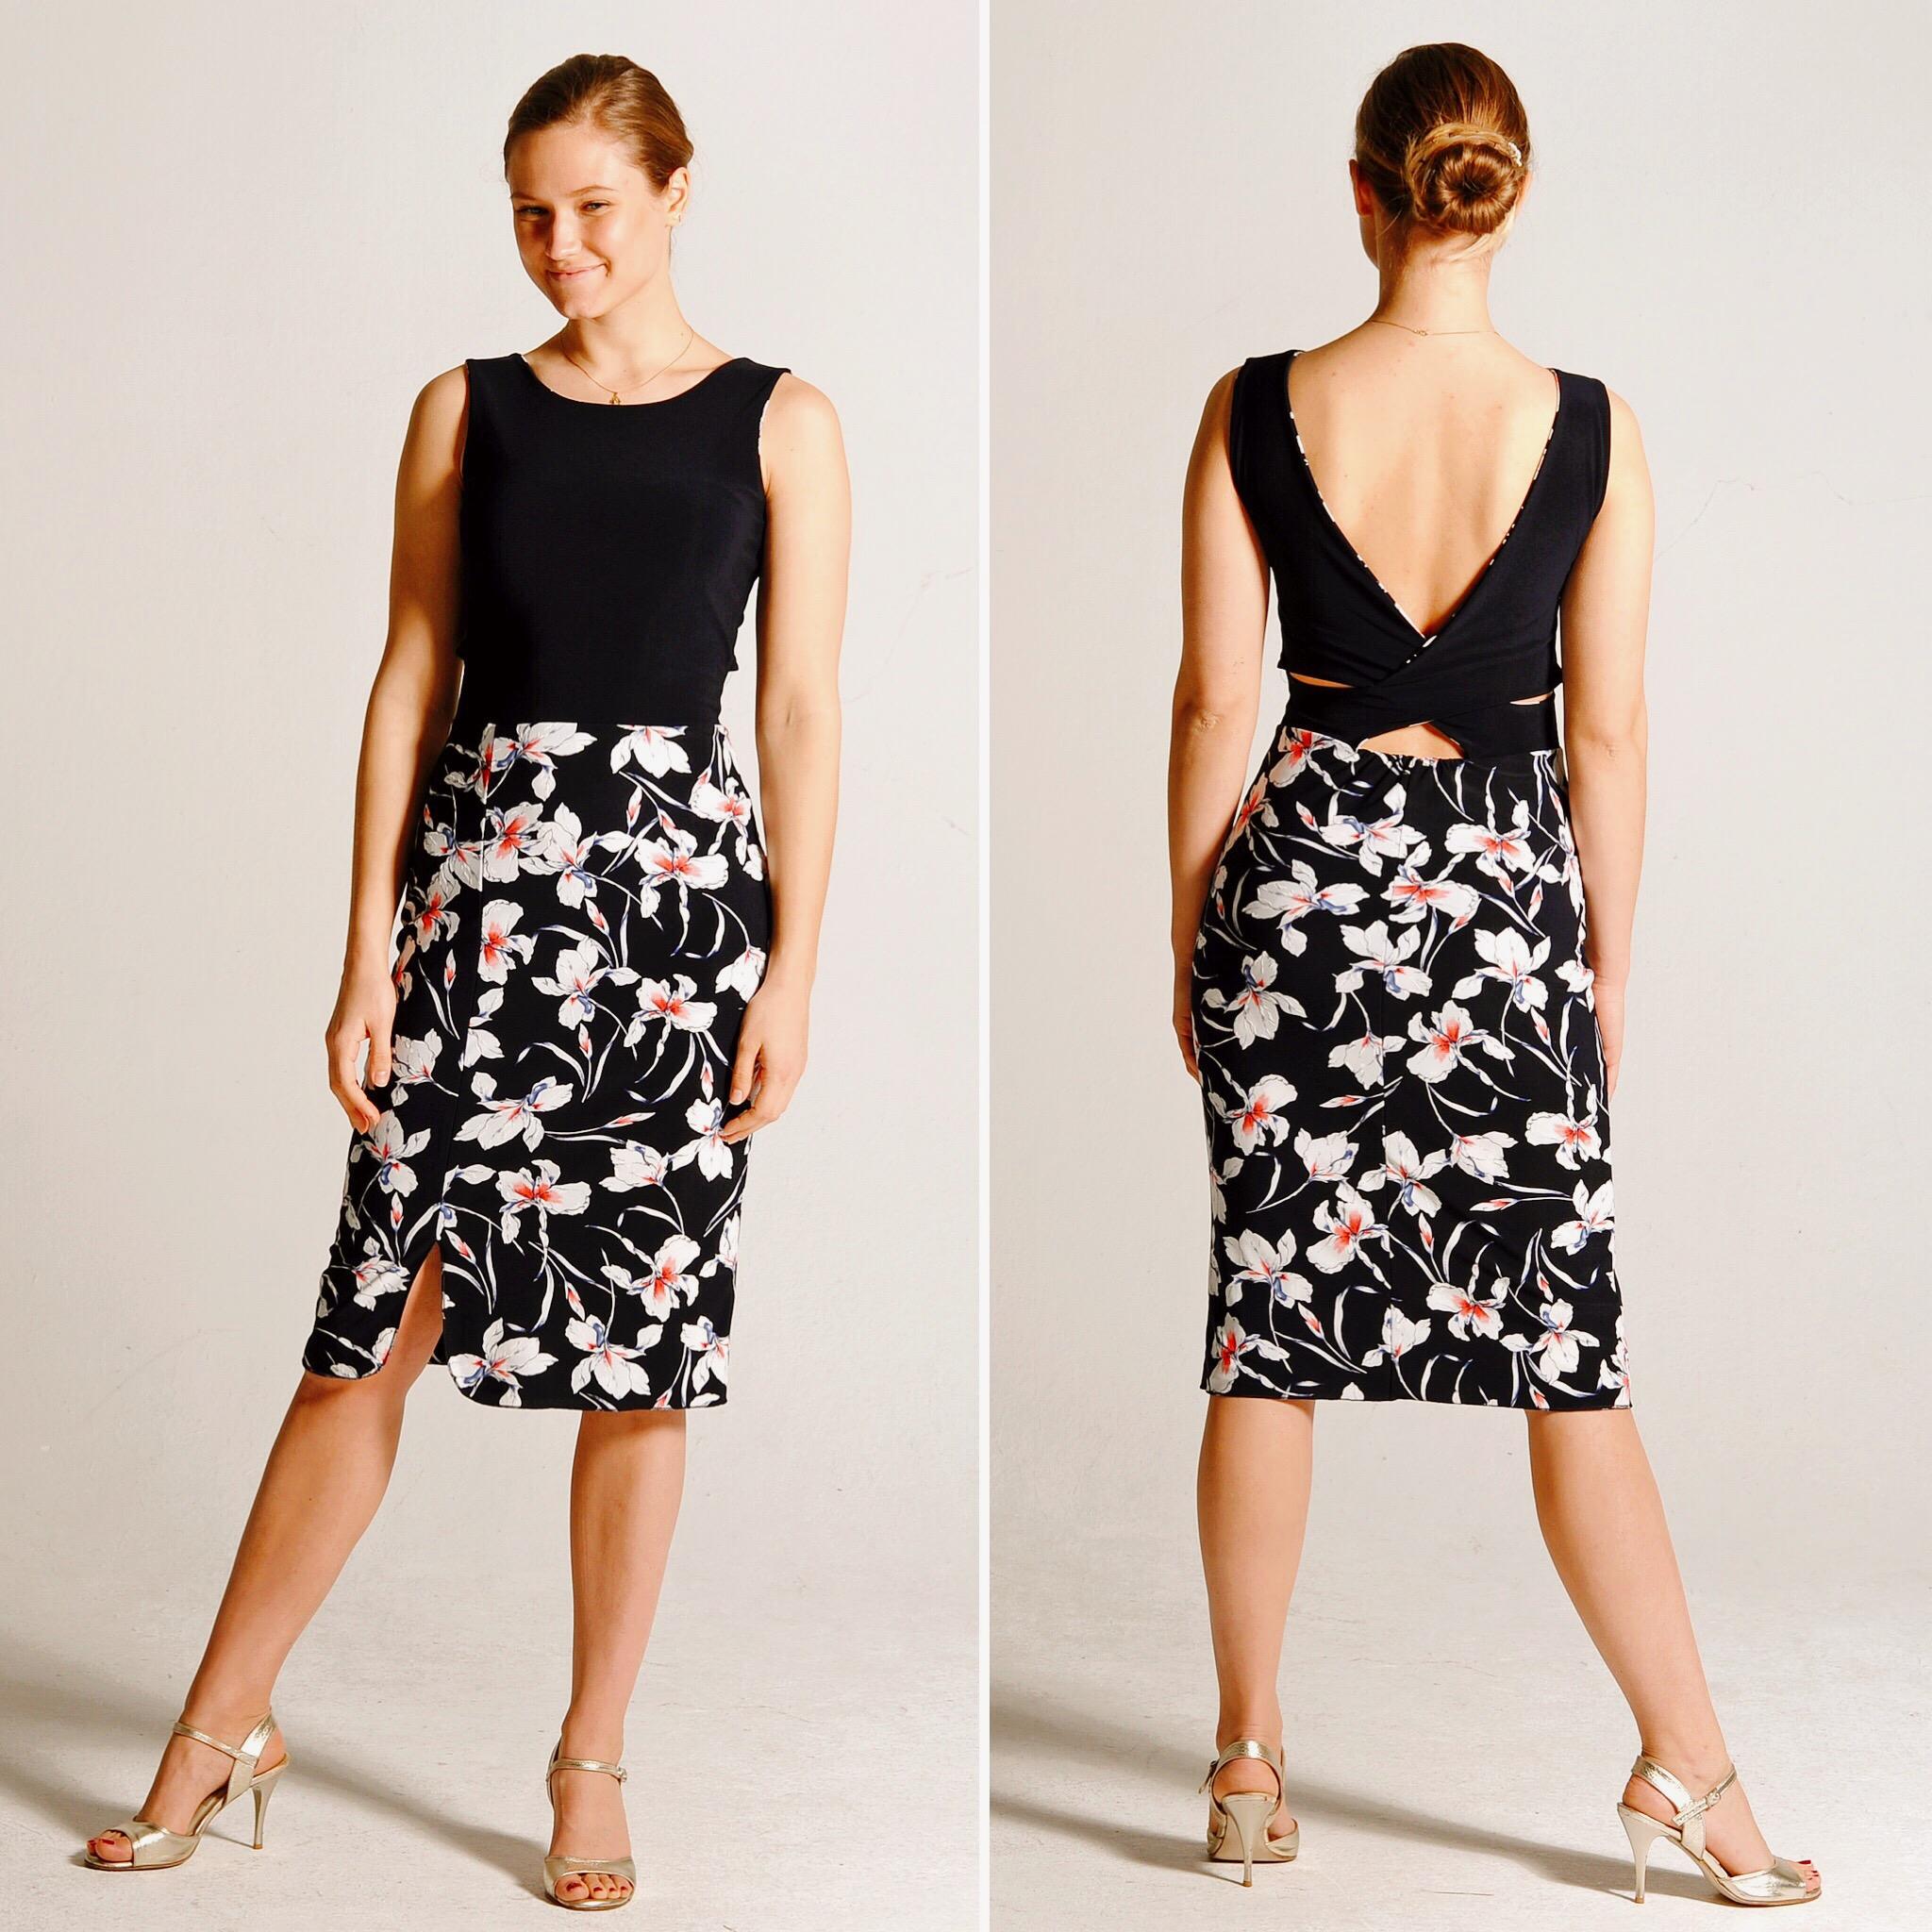 DIANA_reversible_floral_tango_dress_2.JPG